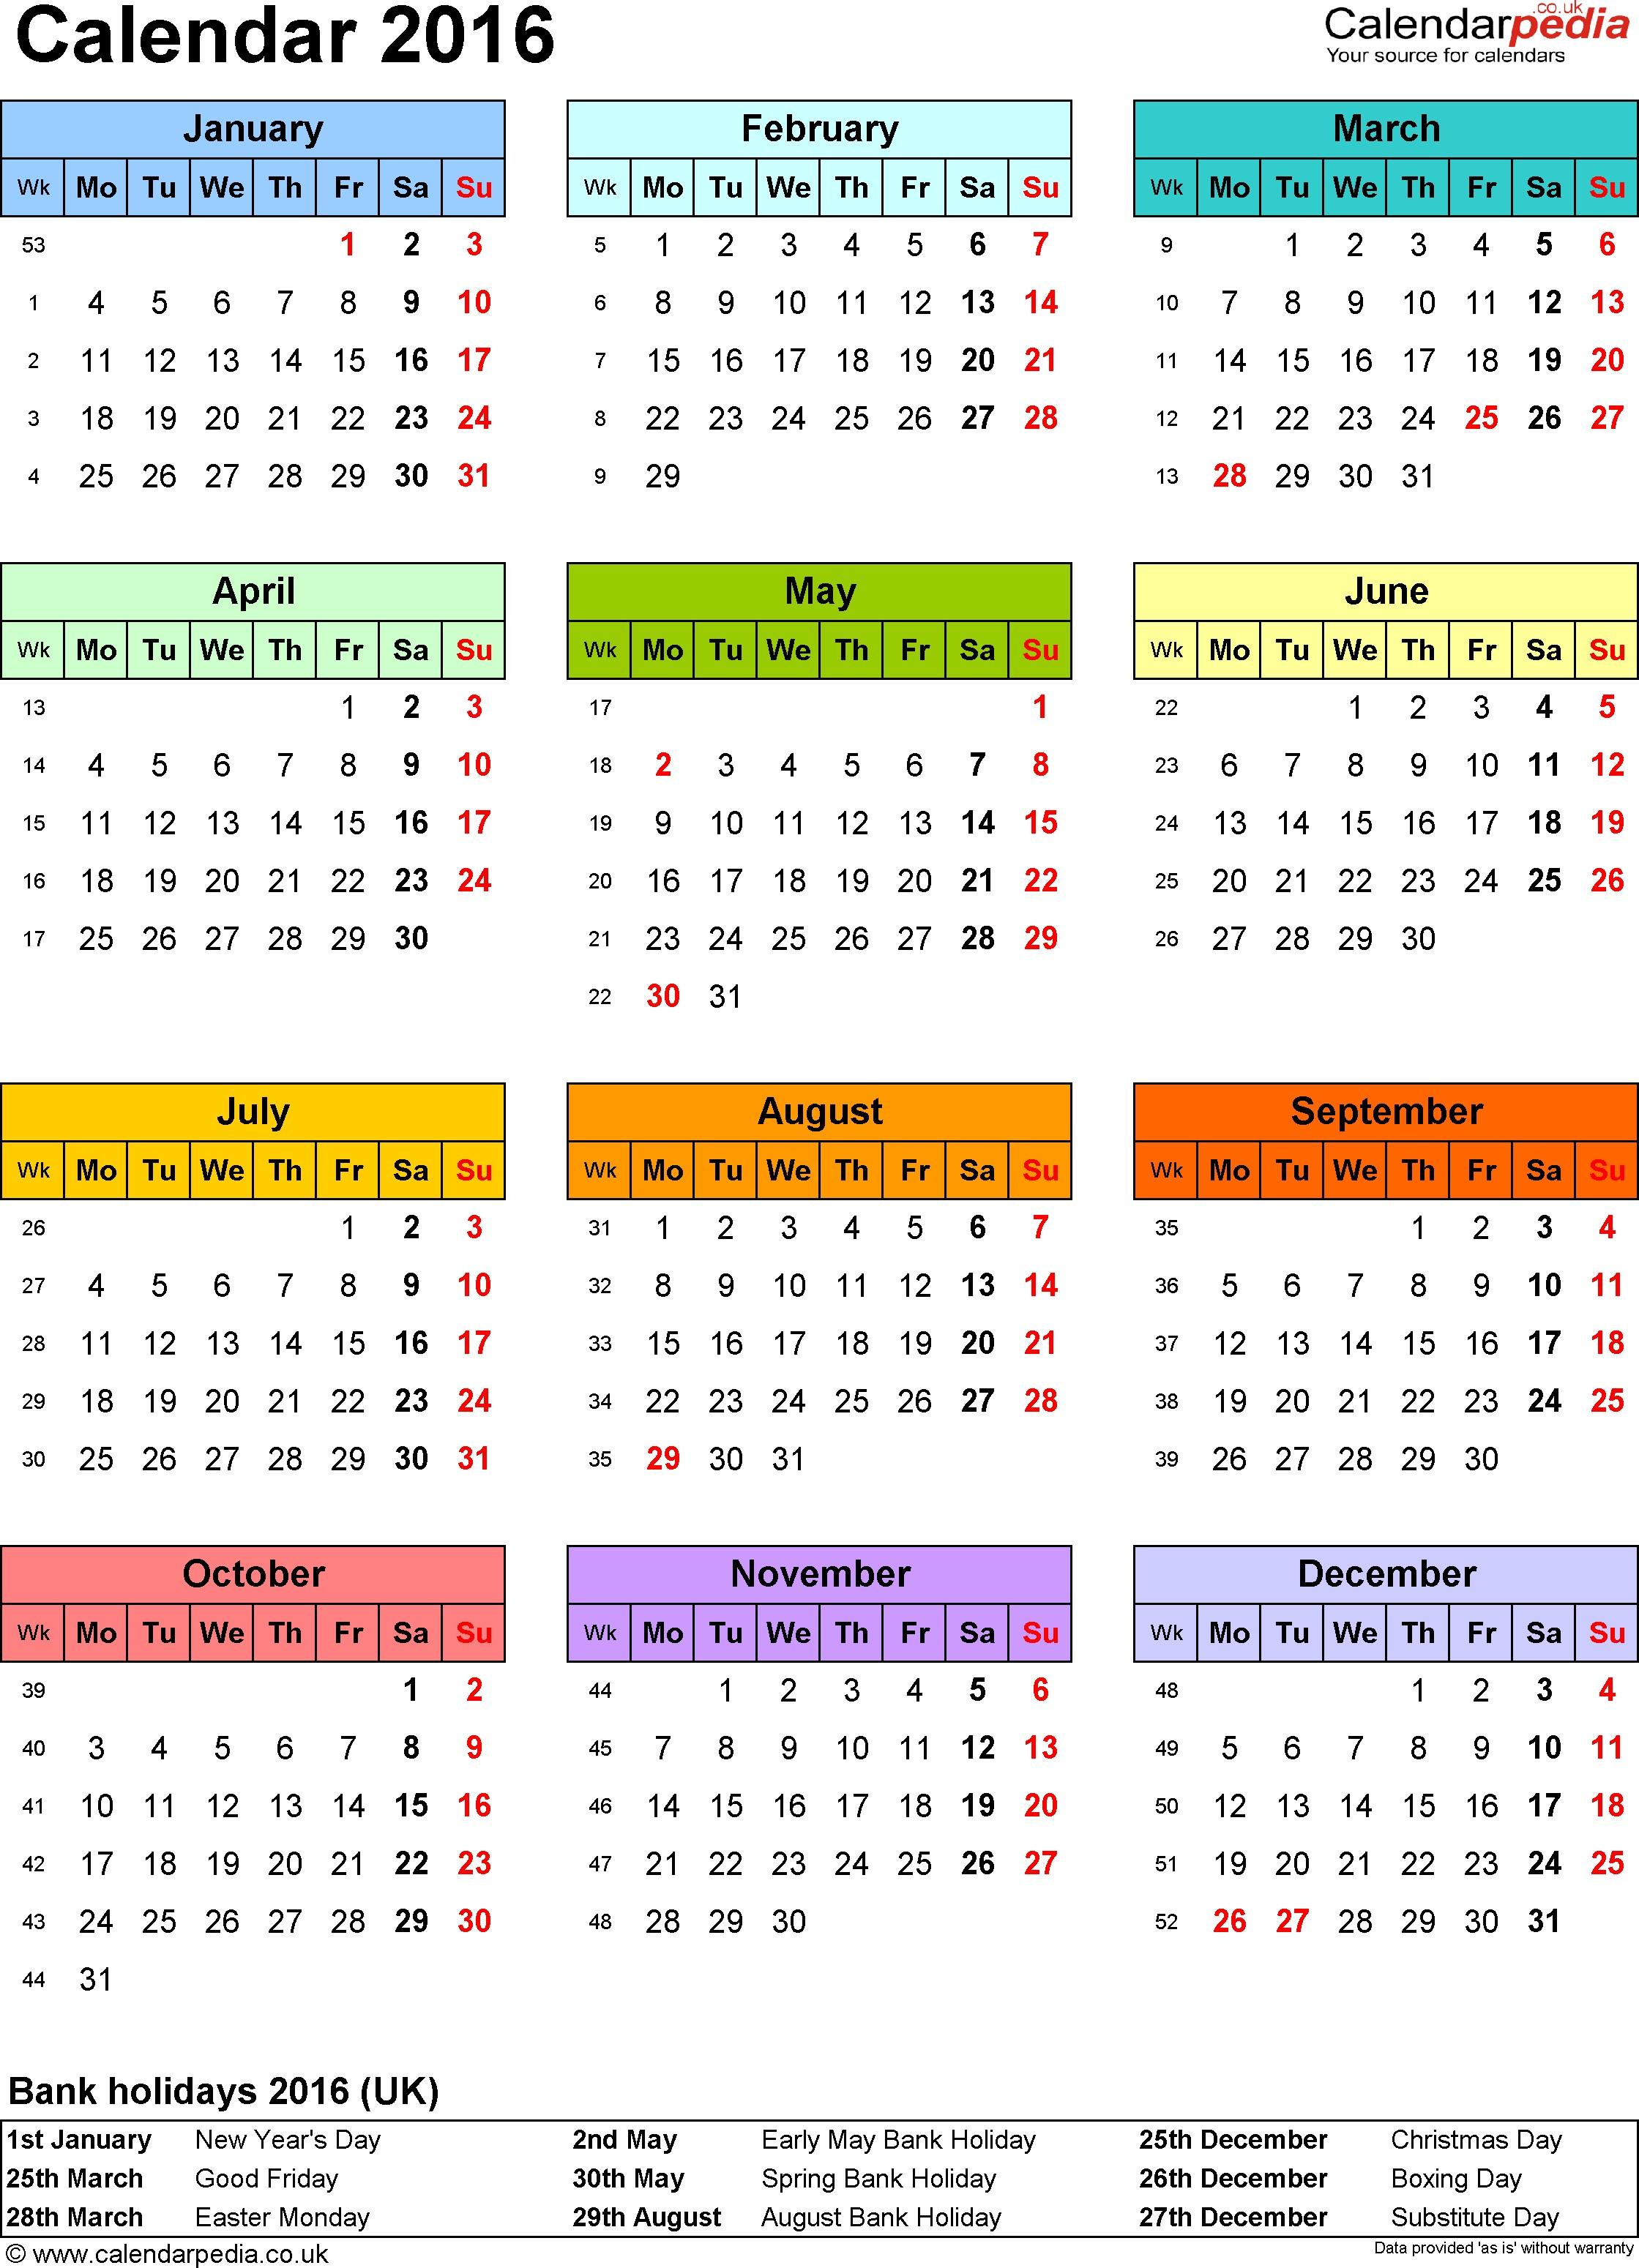 Calendario 2017 Para Imprimir En Word Más Recientes Baby Photo Calendars Kordurorddiner Of Calendario 2017 Para Imprimir En Word Más Recientes Image for November Indonesia Kalender 2018 Kalender